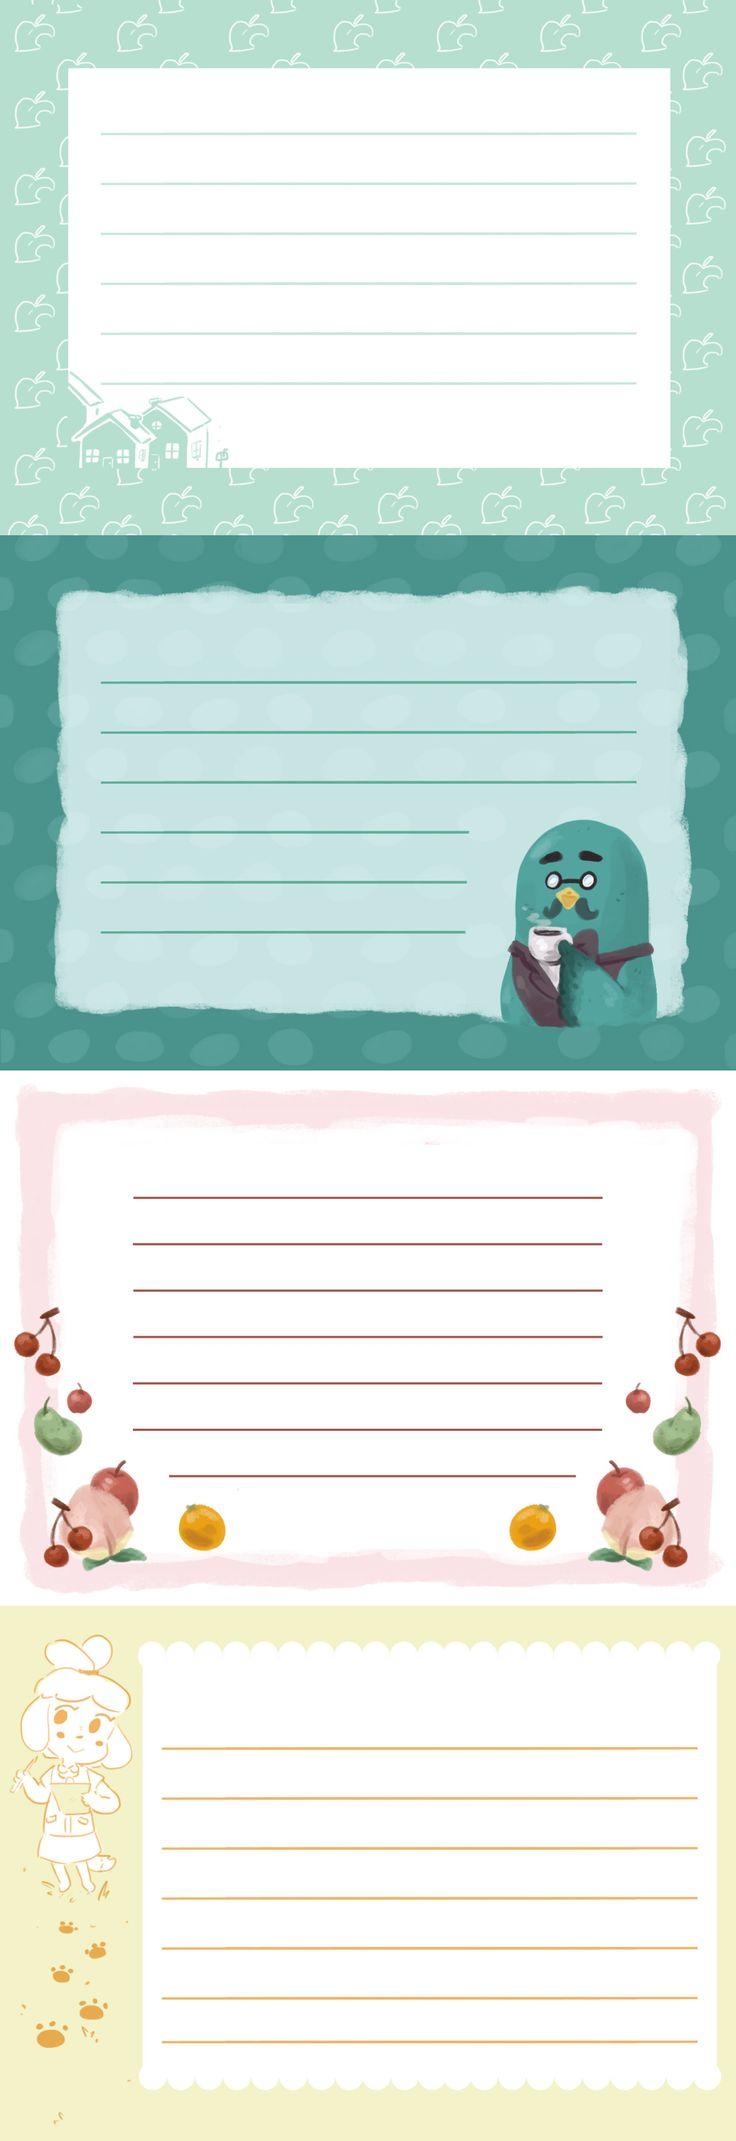 Animal Crossing themed Stationery.